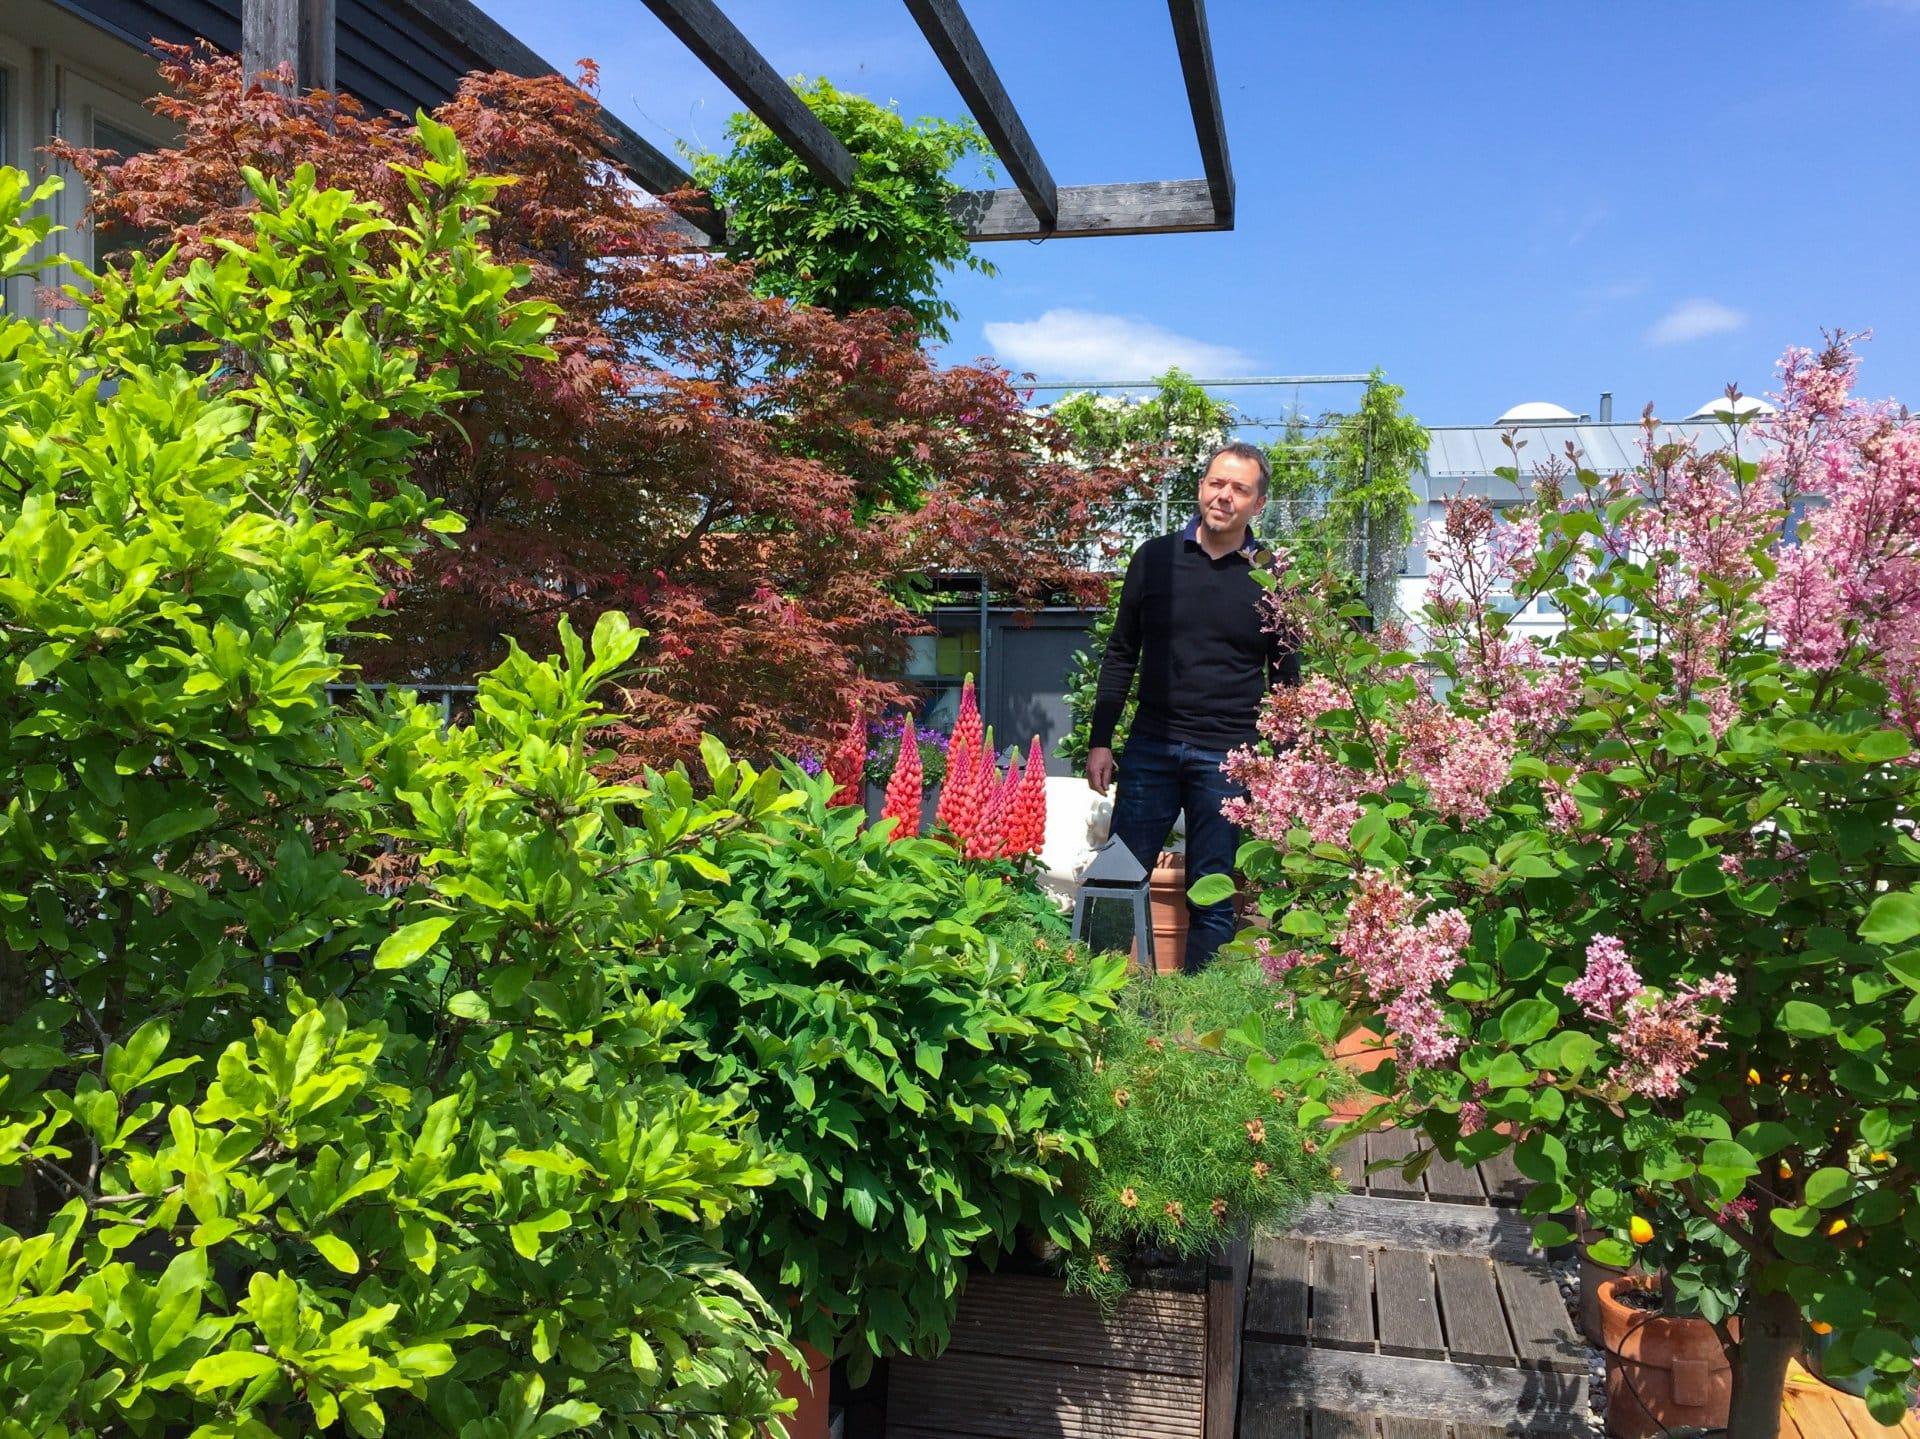 2016 05 14 terrassenpracht 4